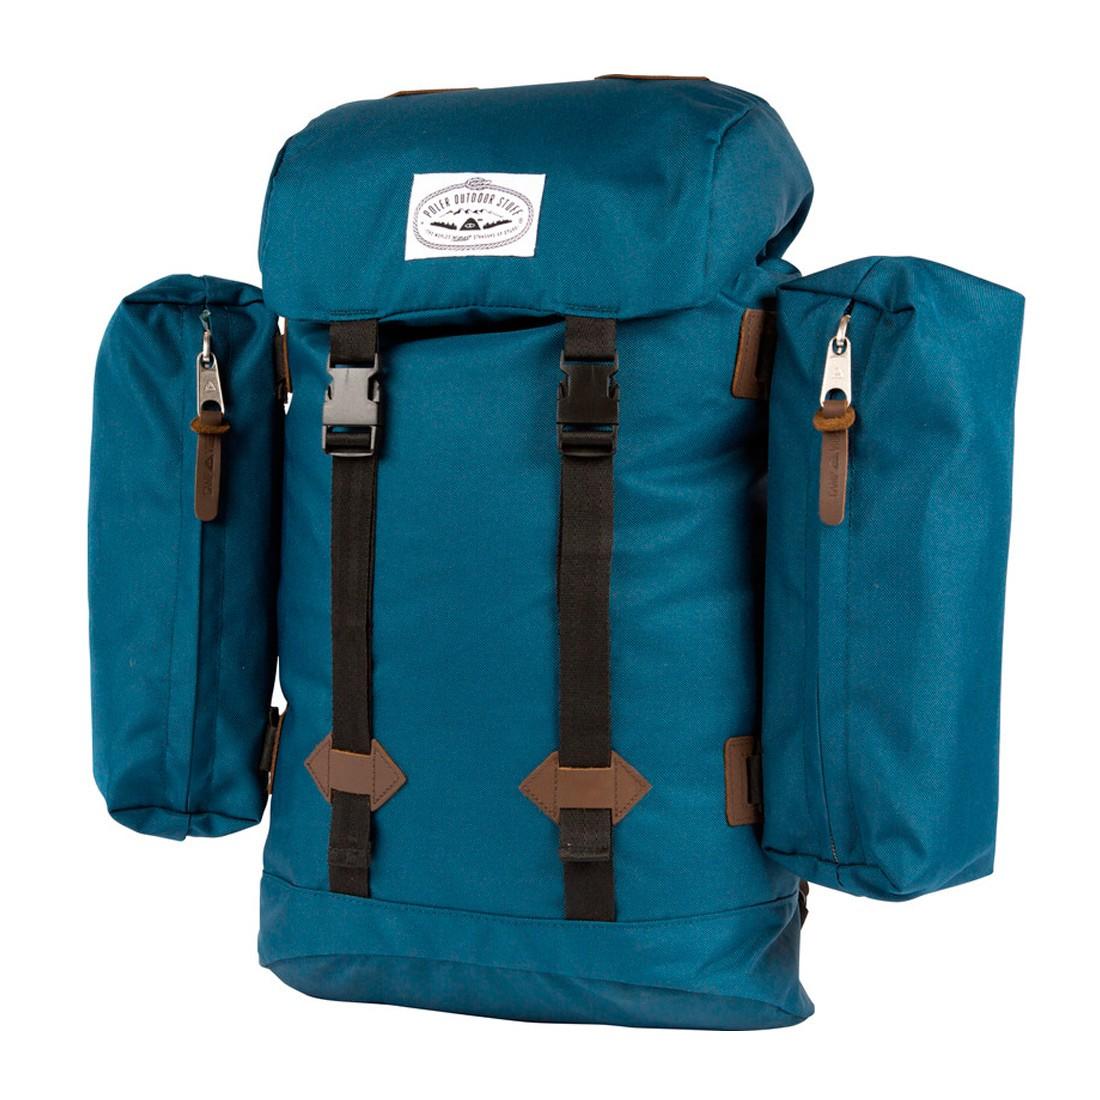 543a01b3b Buy Poler Stuff Rerto Classic Rucksack Navy backpack online